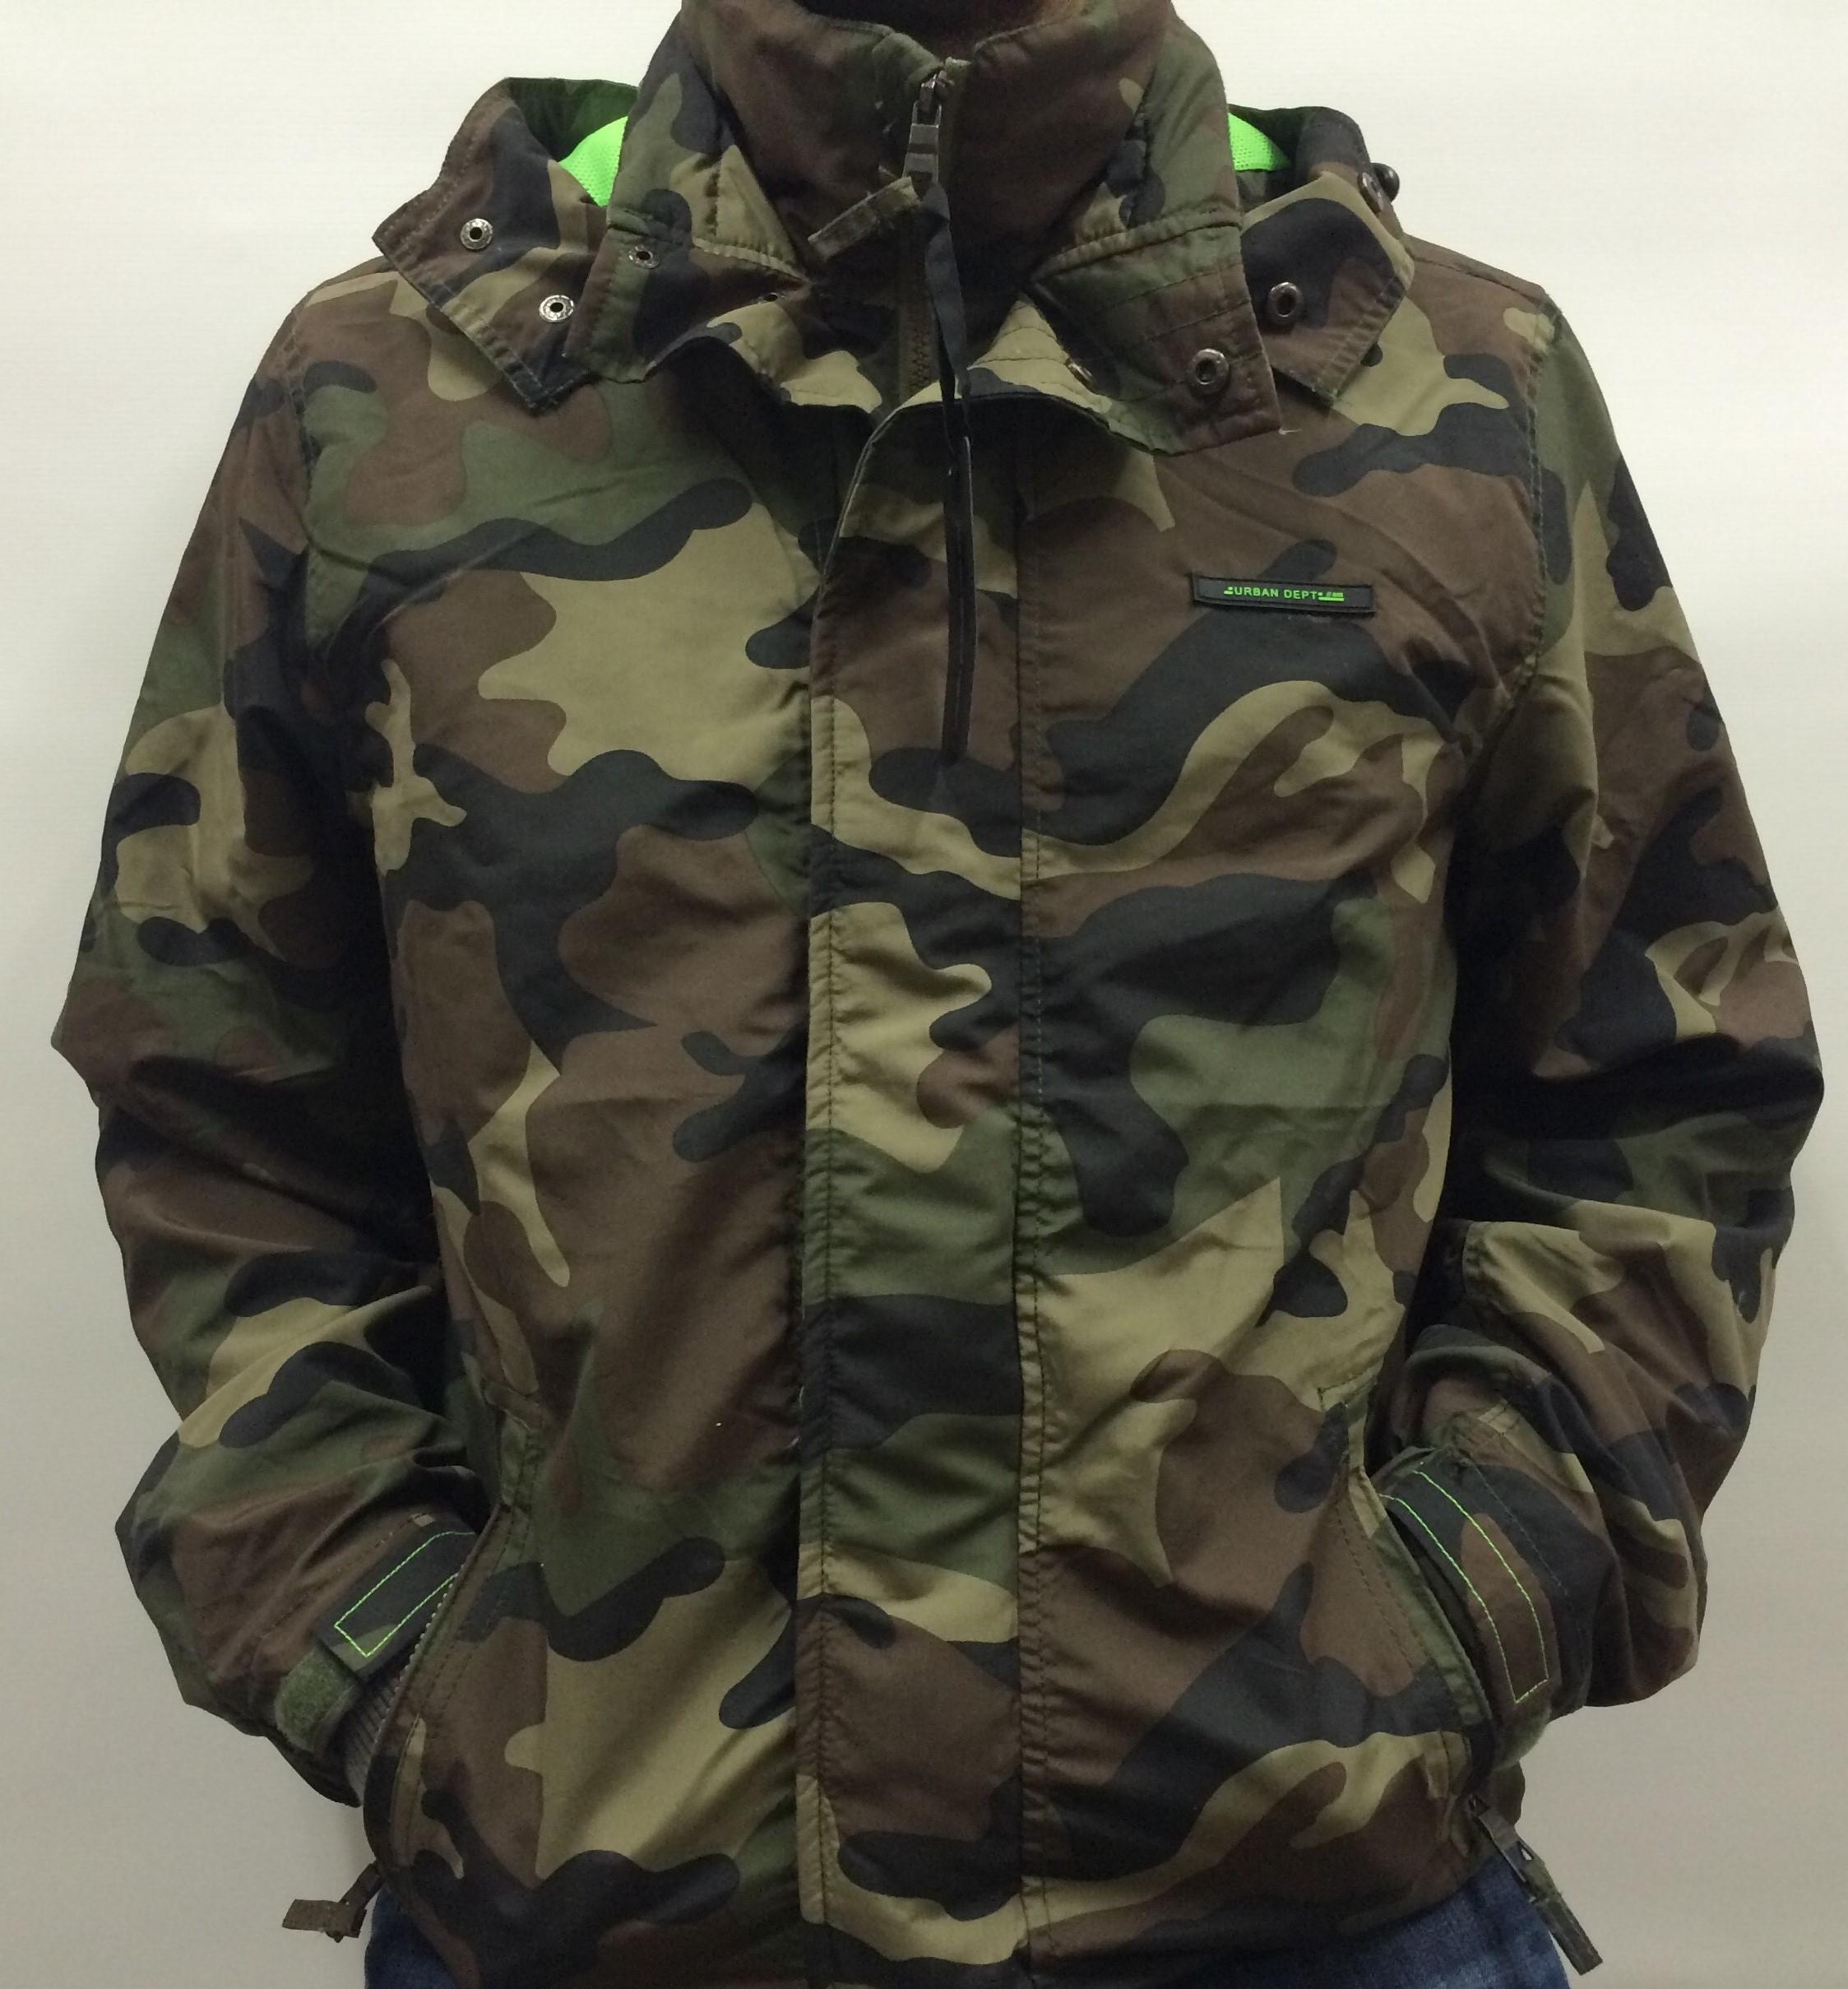 john devin windjacke herren gr xl jacke army bw militay tarn camouflage gr n neu ebay. Black Bedroom Furniture Sets. Home Design Ideas